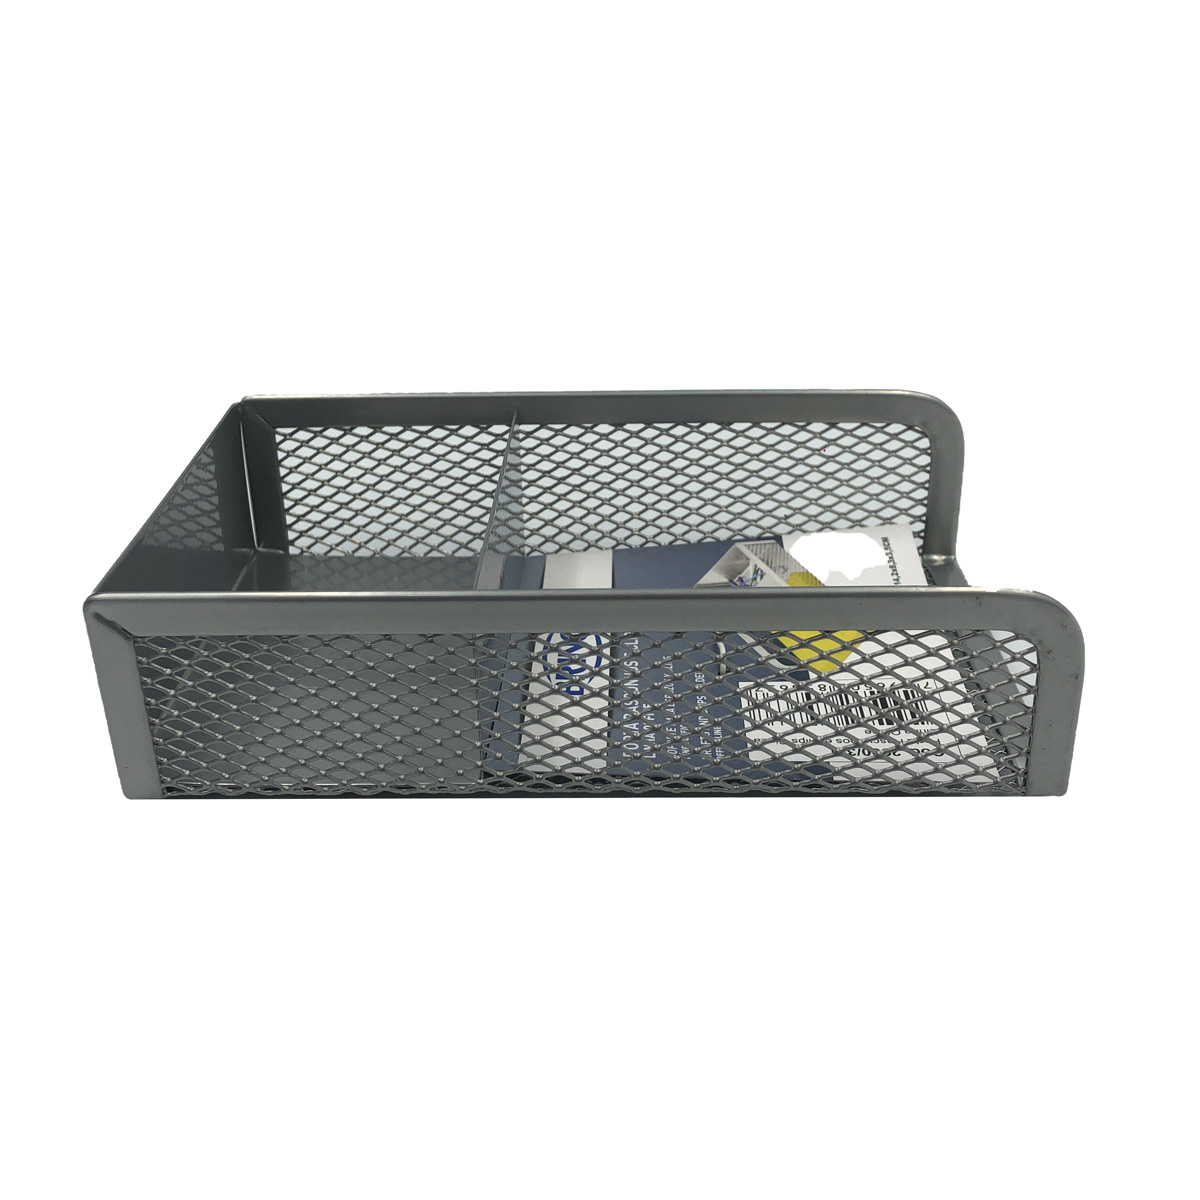 Organizador Porta Papel e Clips Office Cinza 2990/311 Brinox